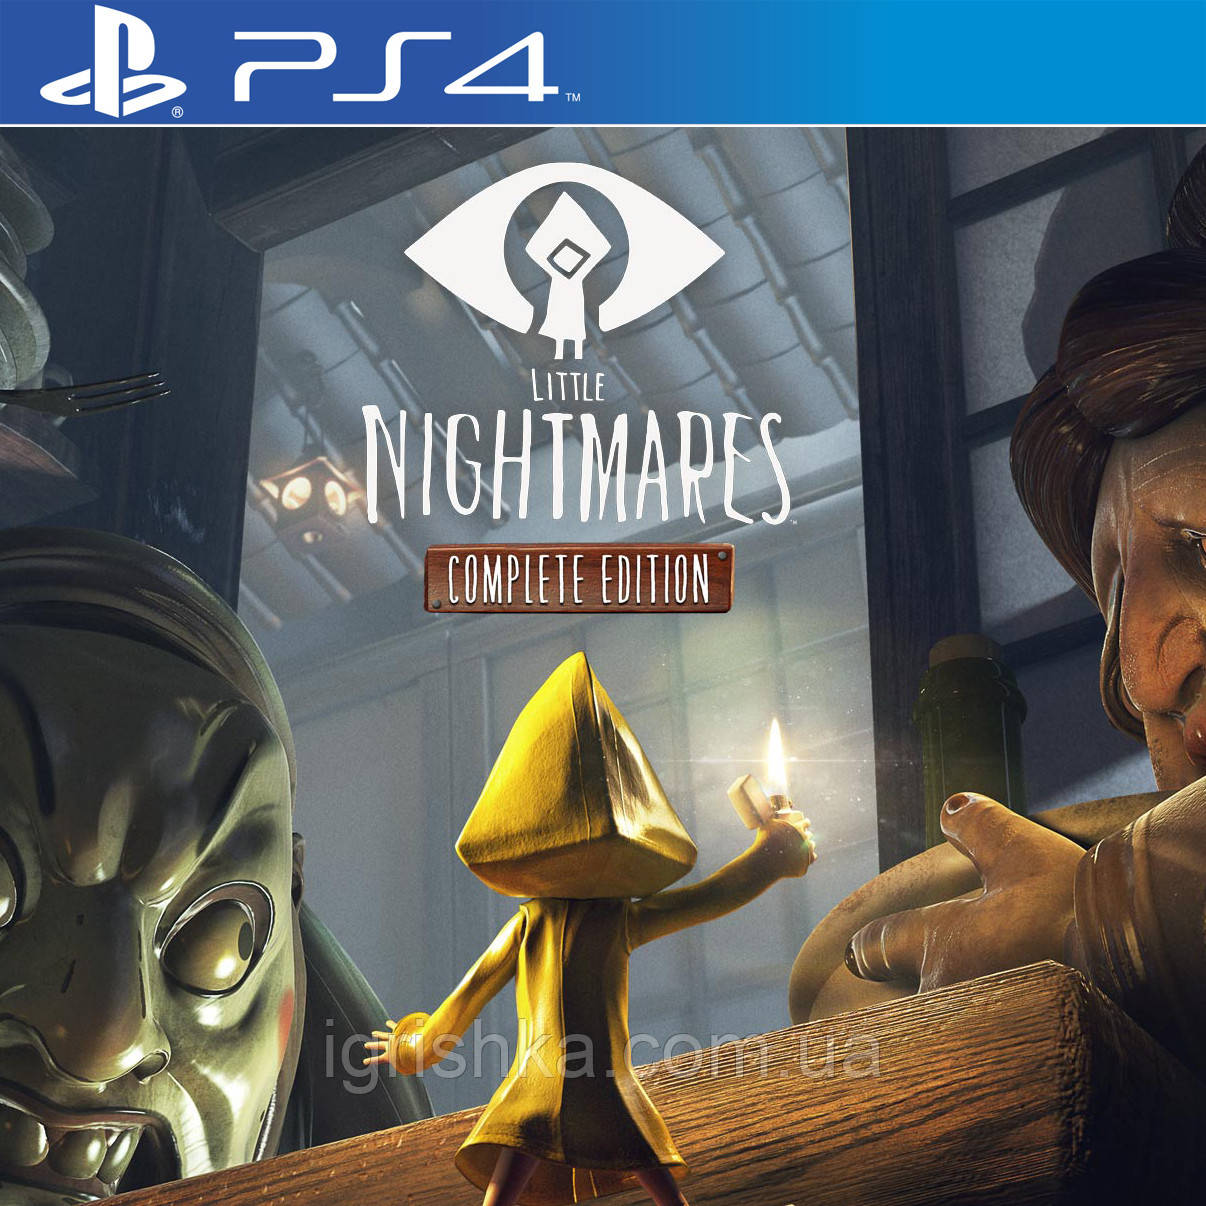 Little Nightmares Complete Edition Ps4 (Цифровой аккаунт для PlayStation 4)